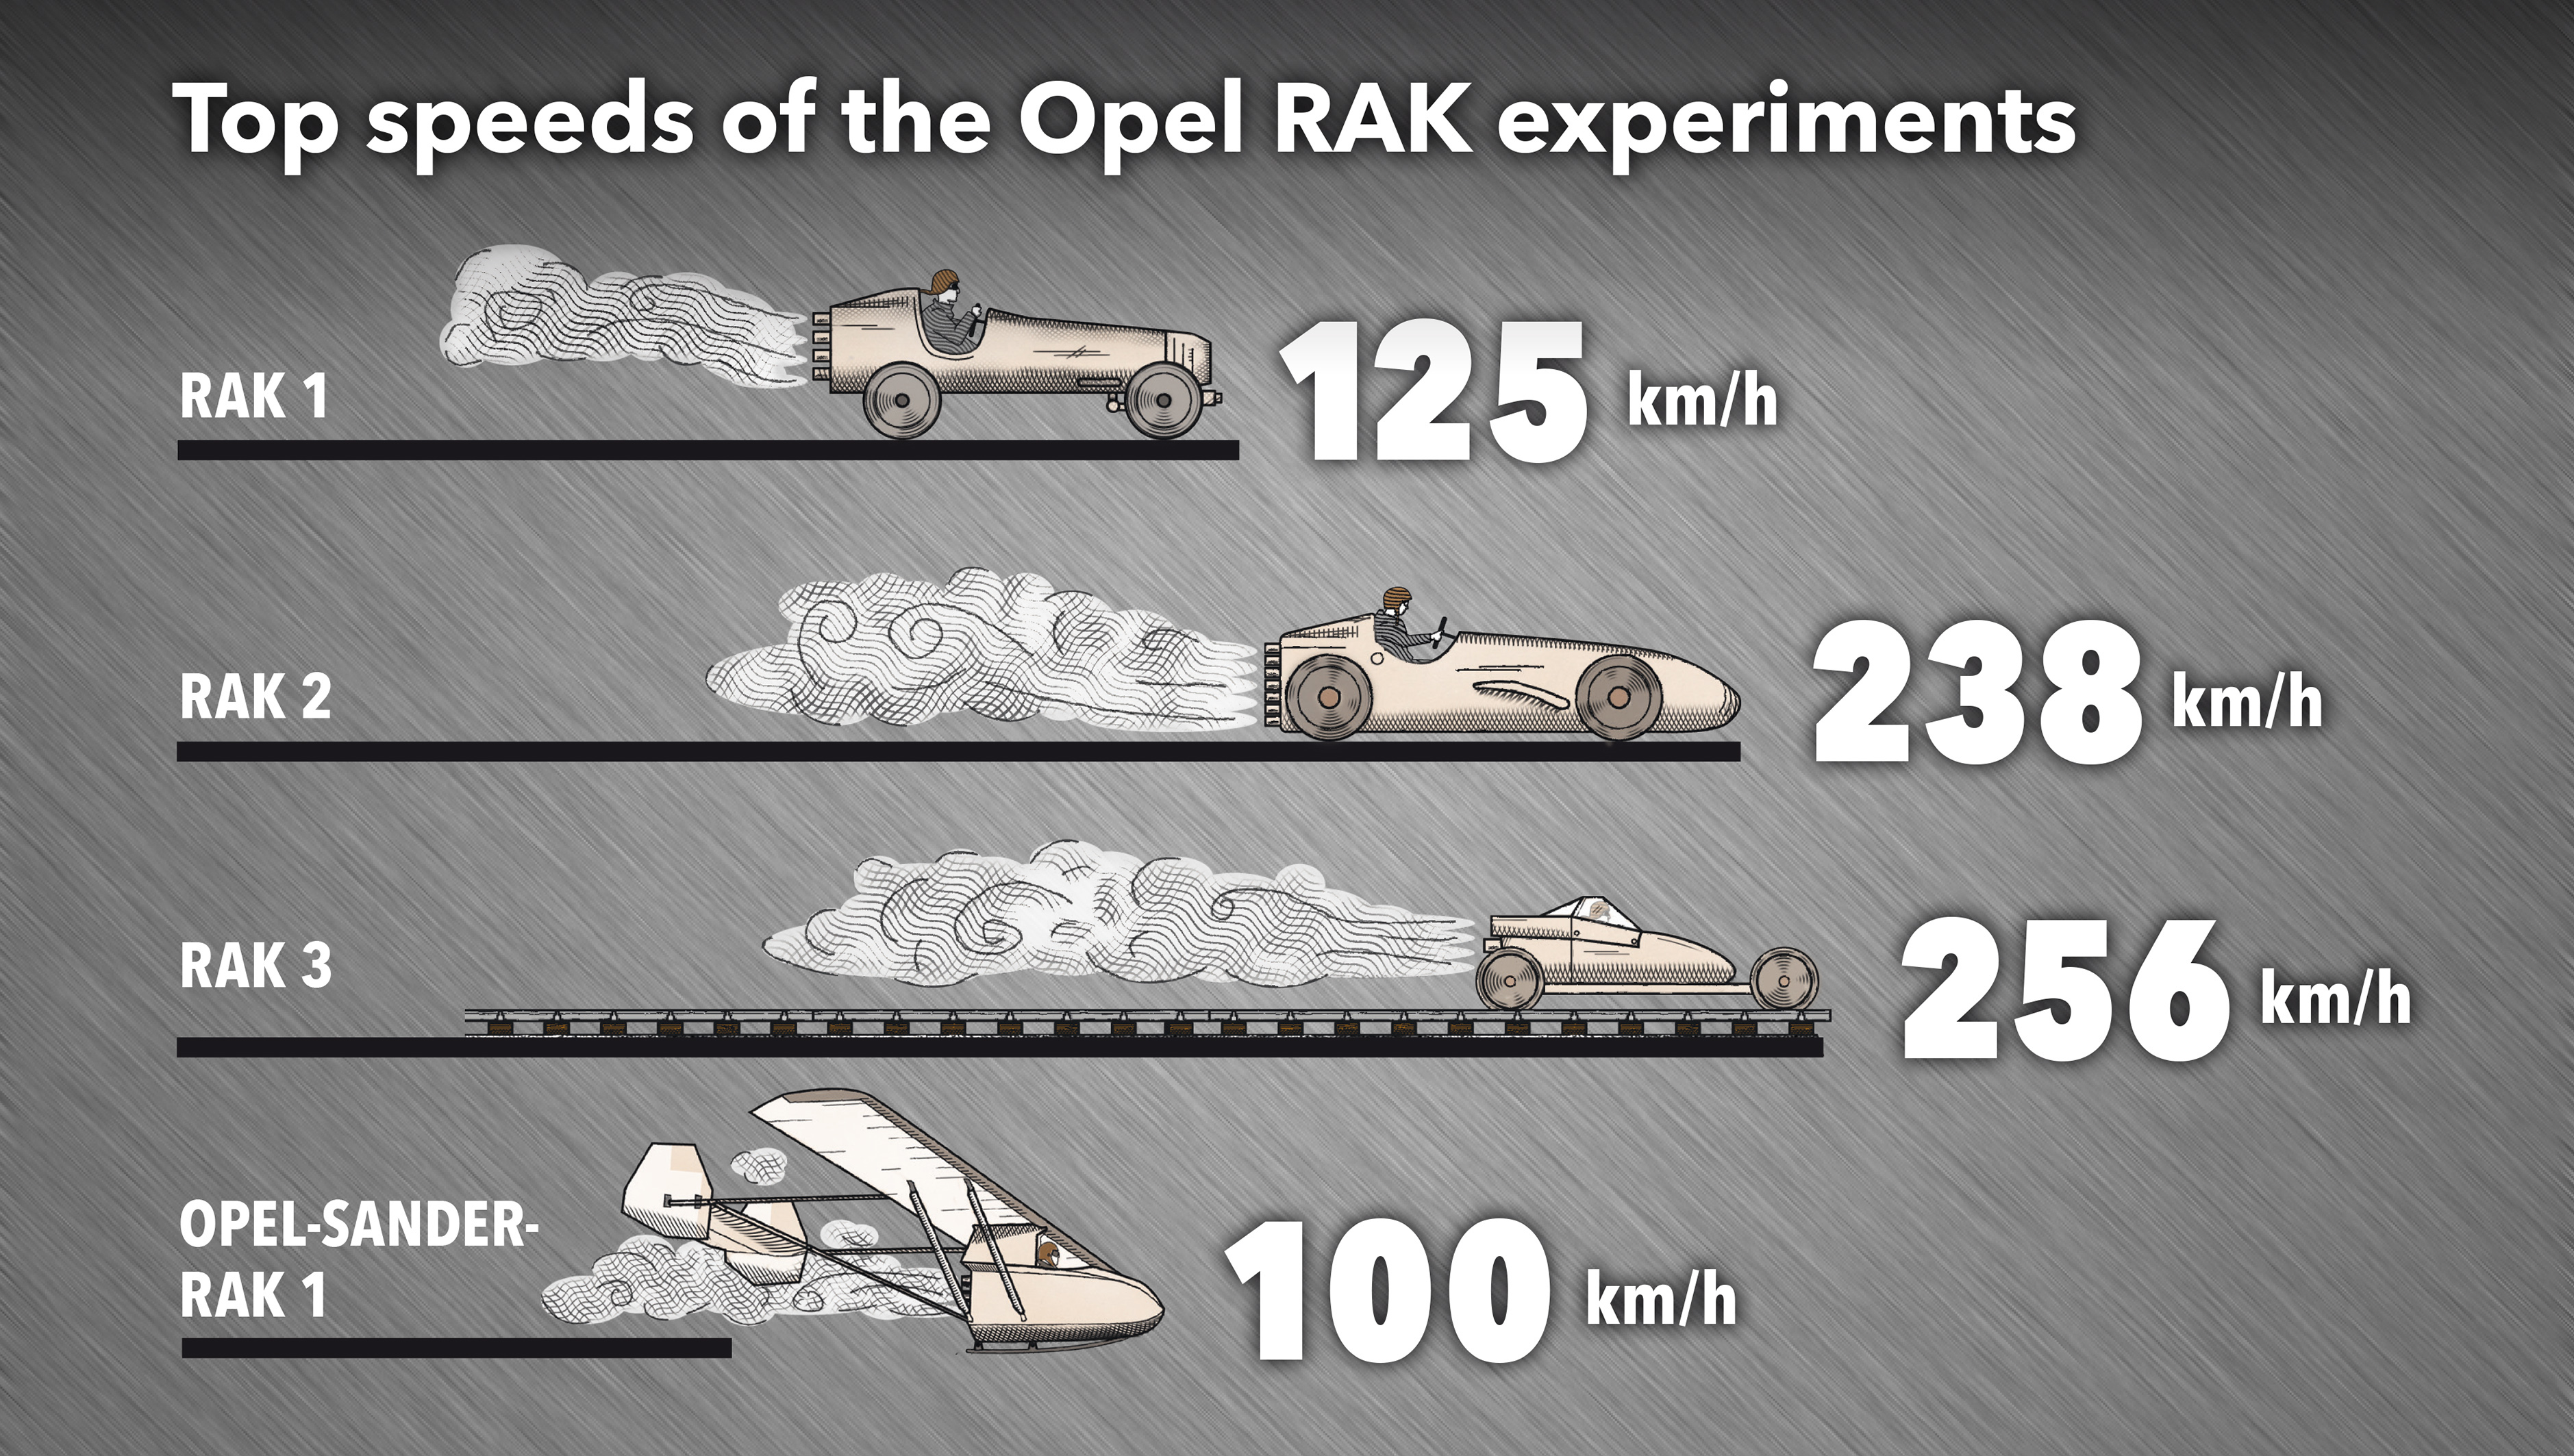 RAK 2 celebrated 90th birthday